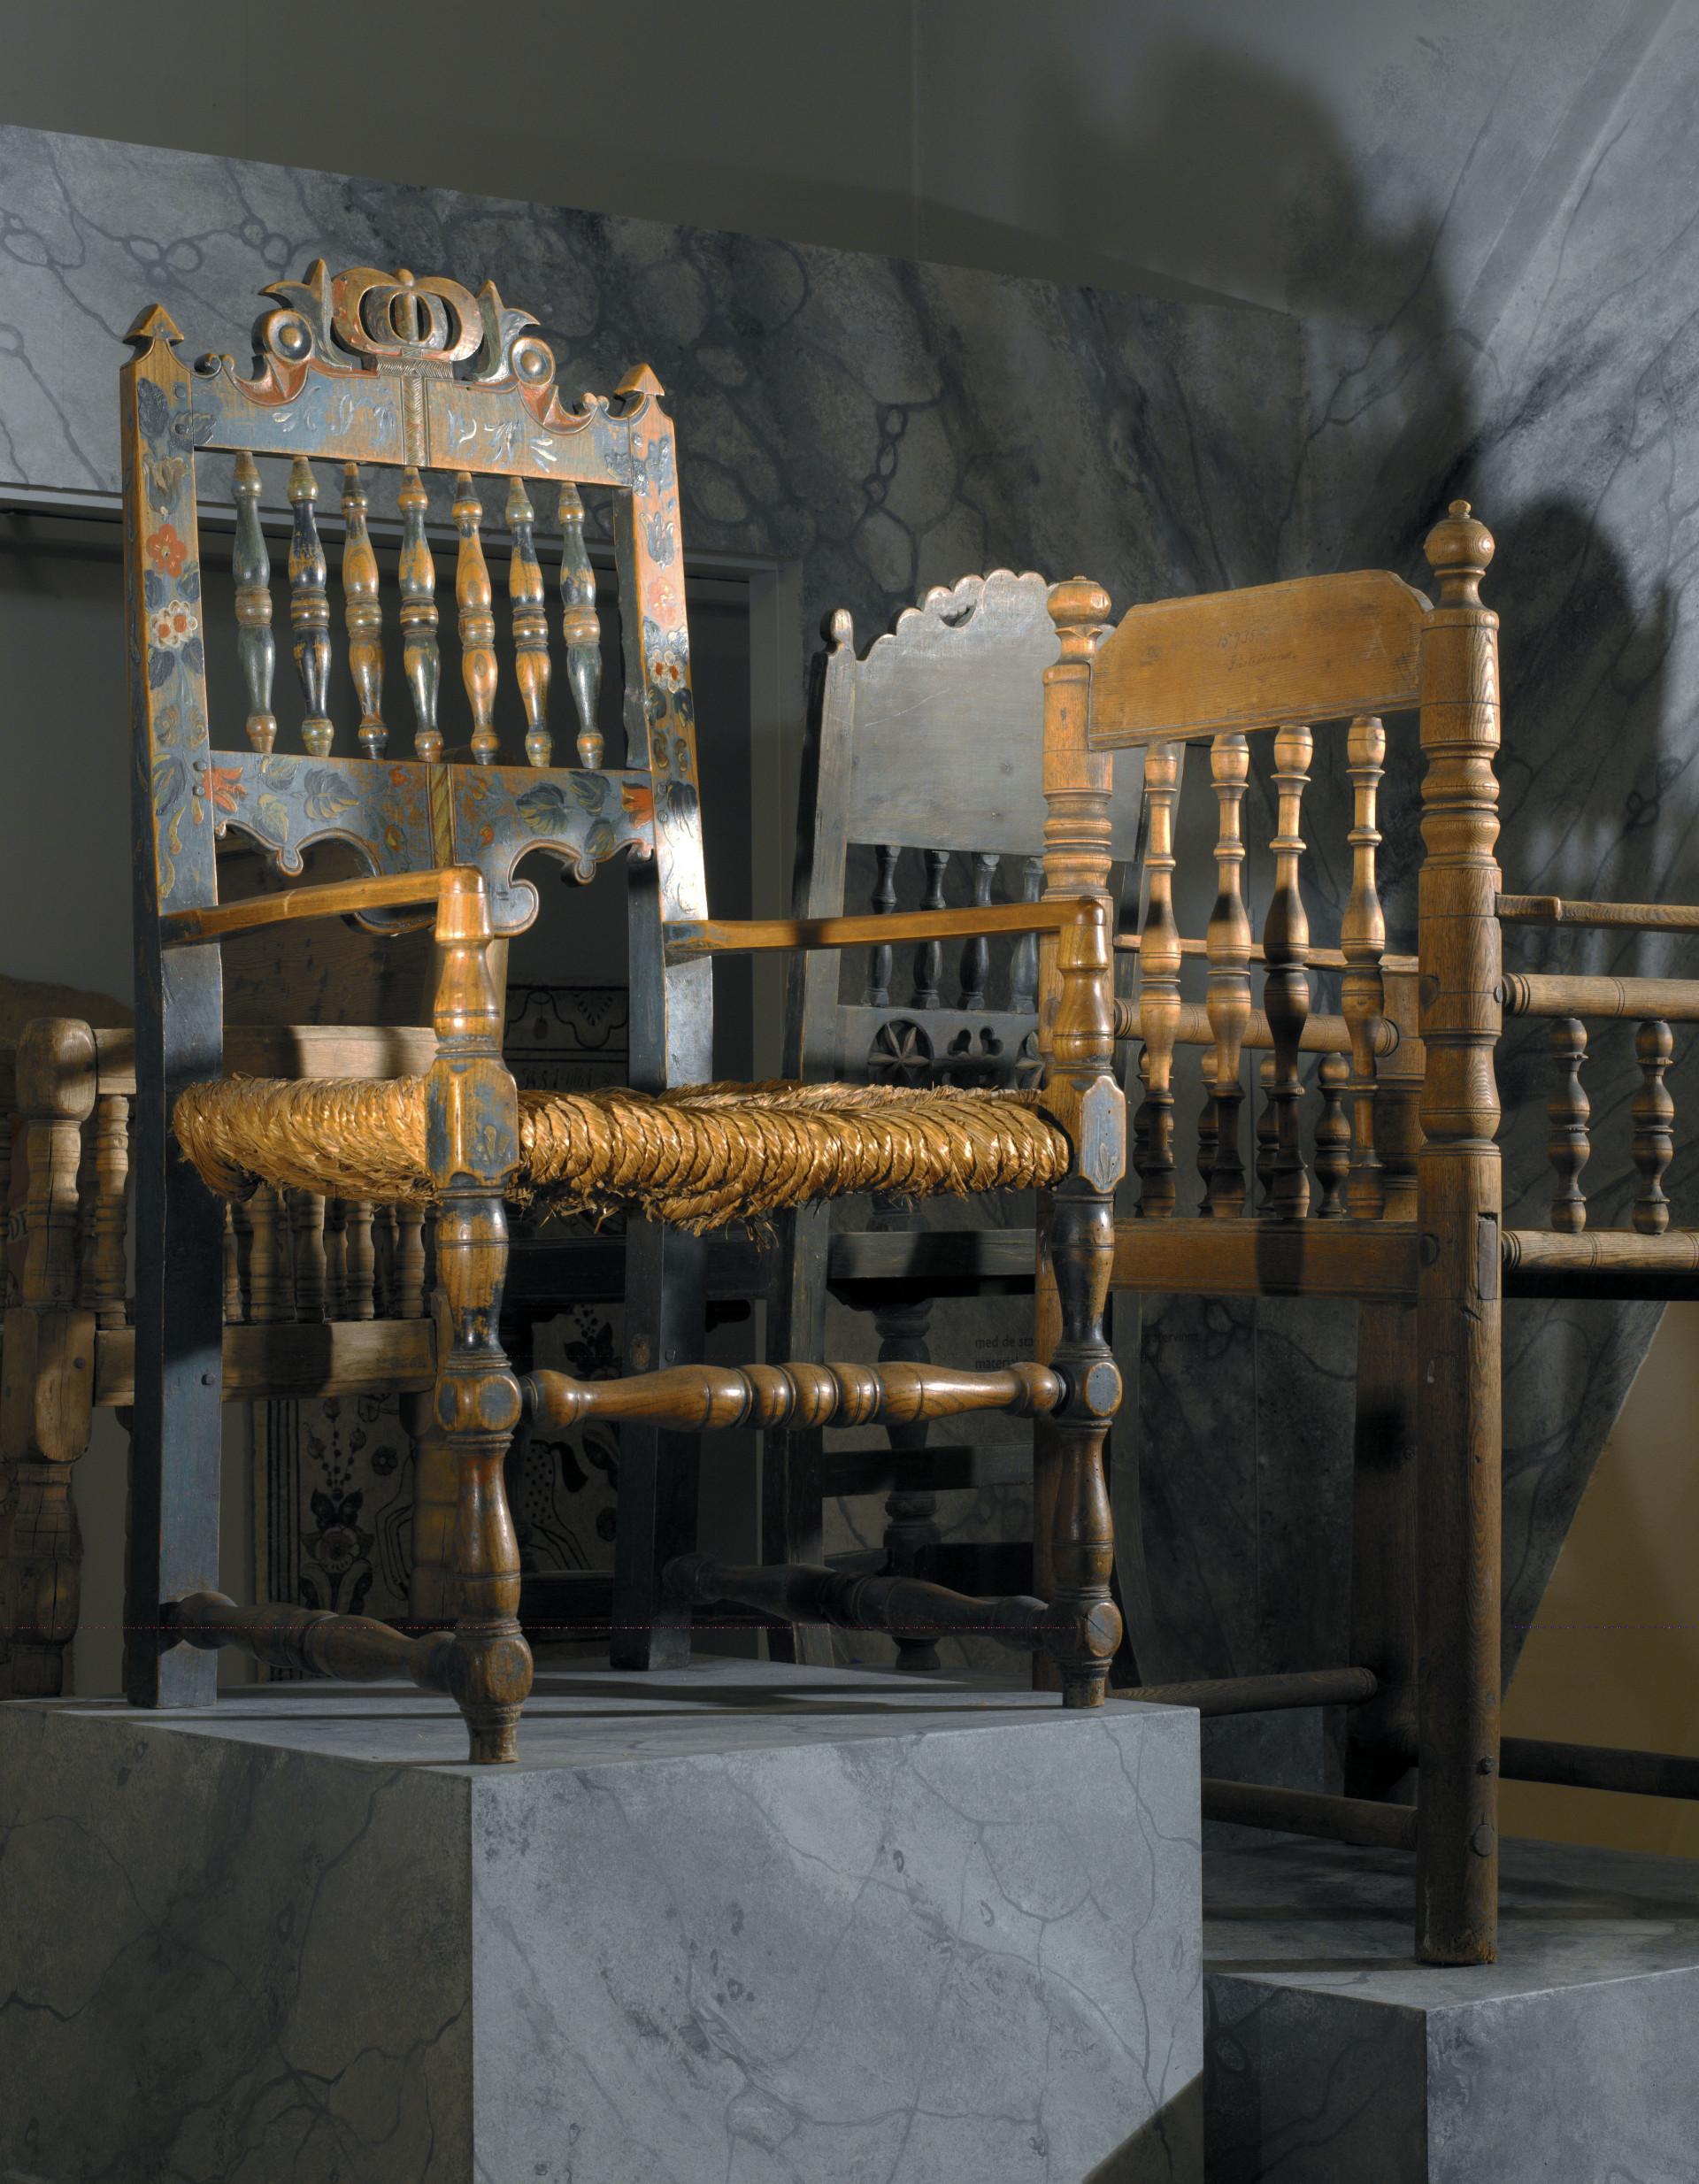 Foto: Mats Landin/ Nordiska museet.